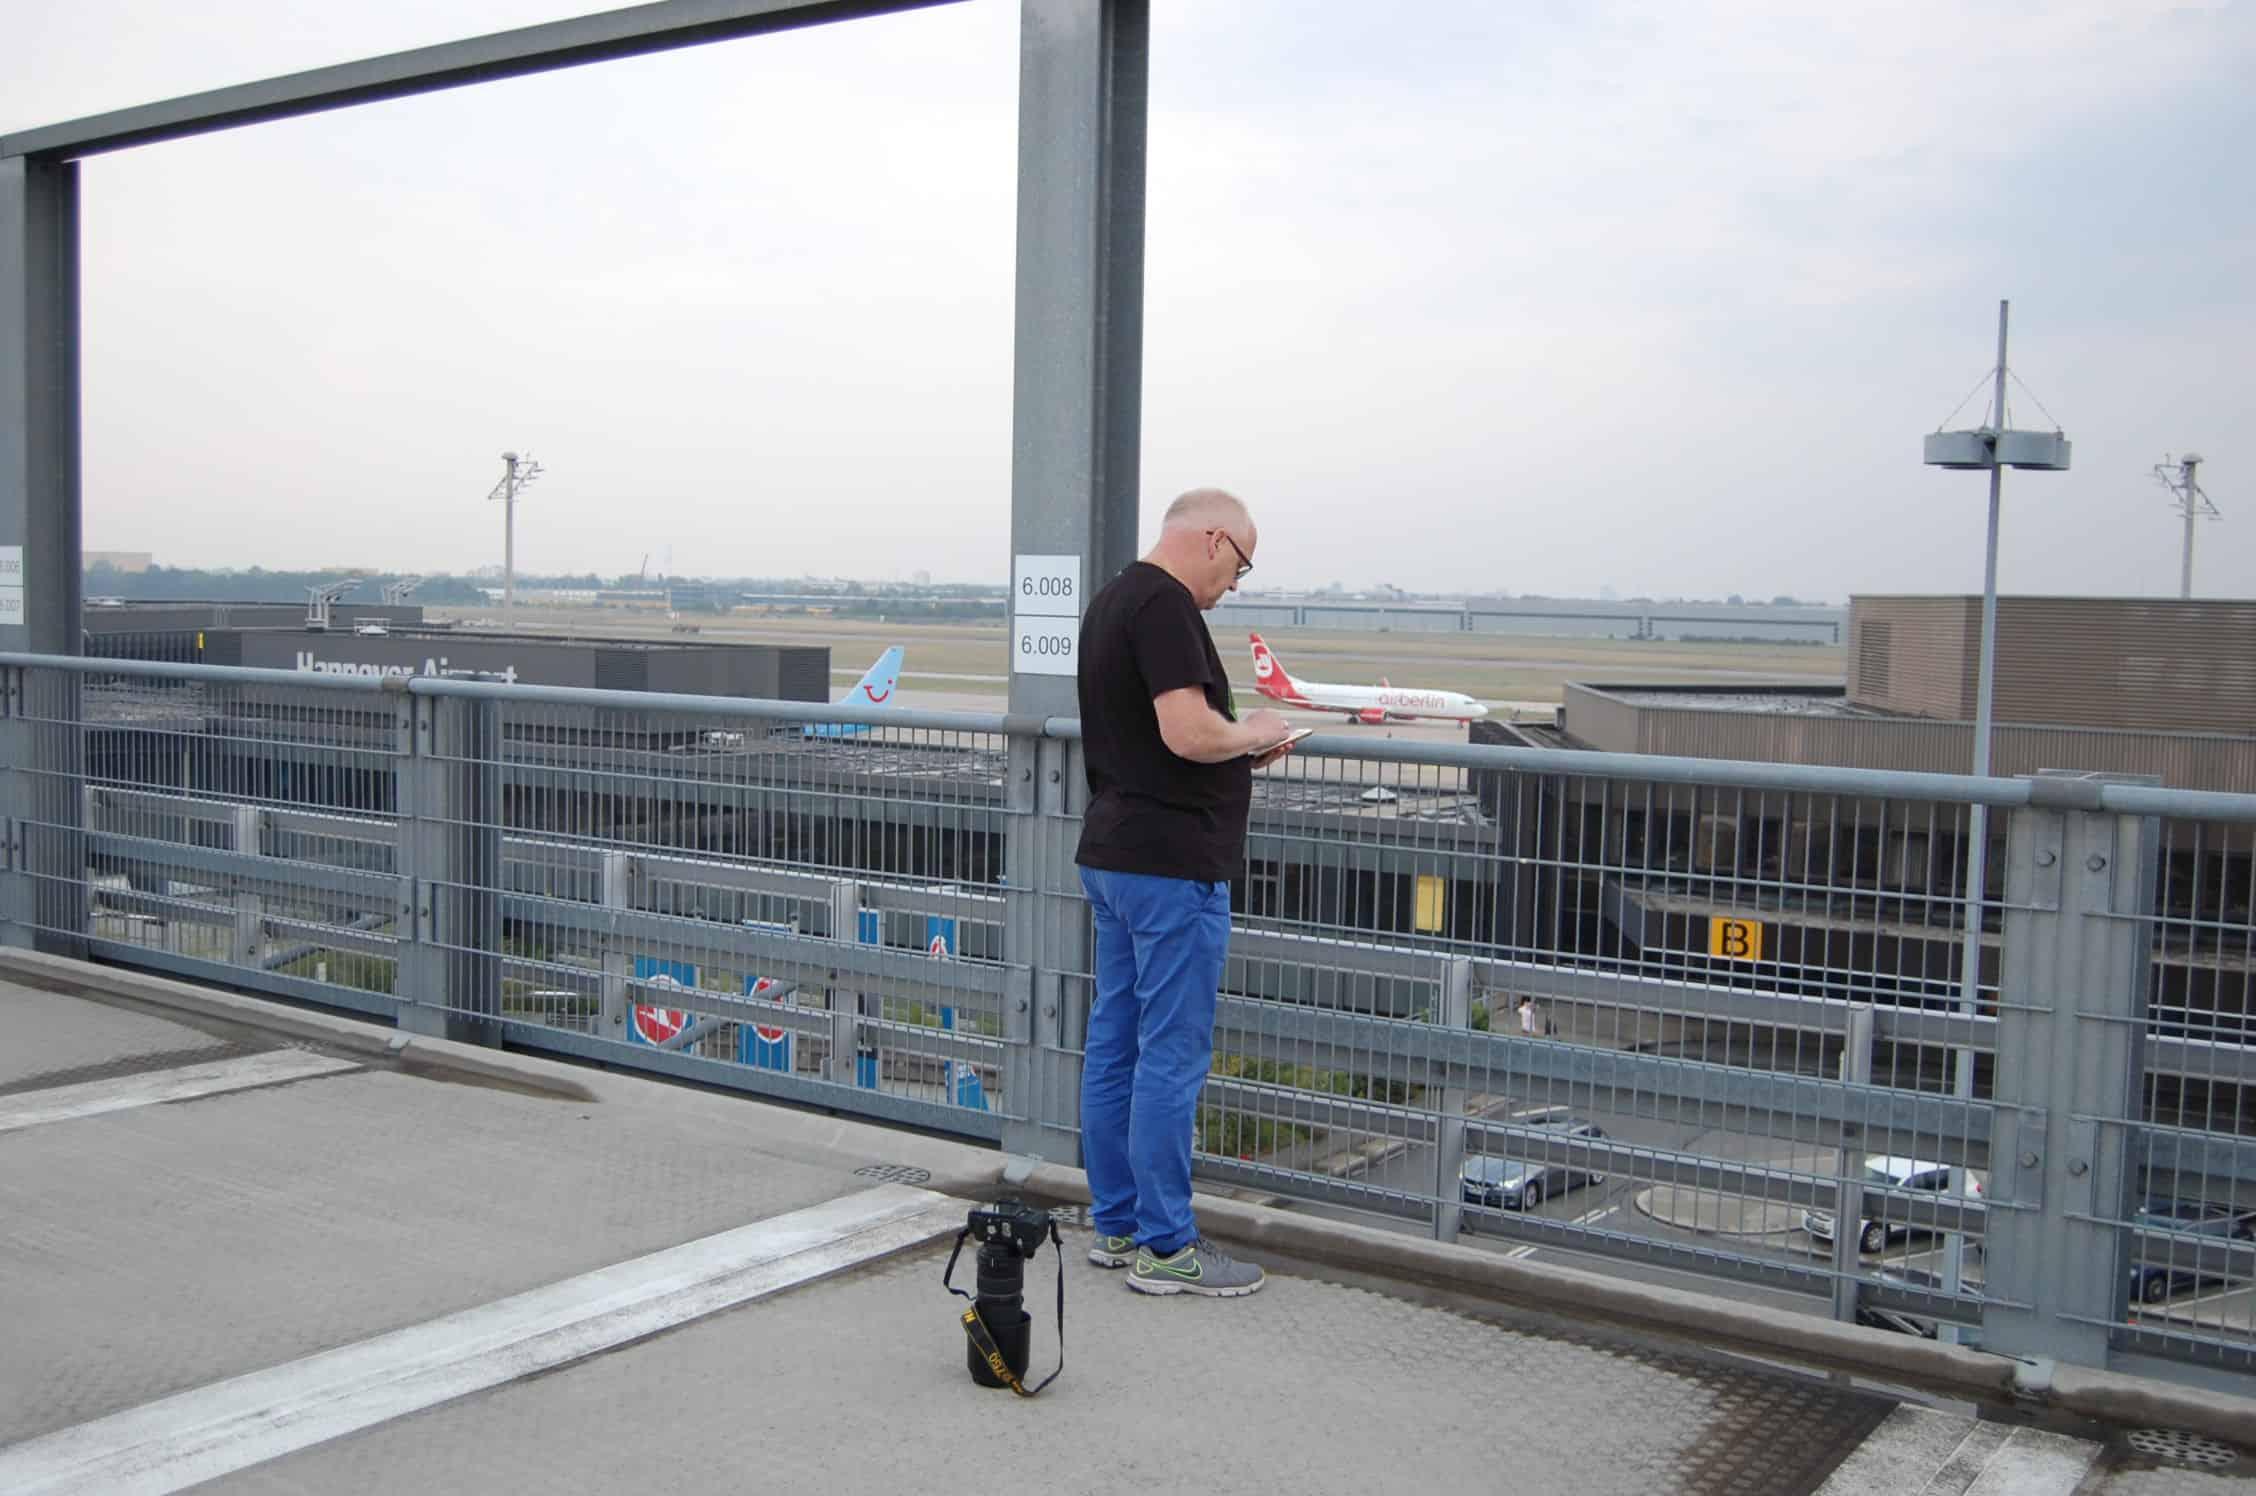 Flugzeug Spotter am HAJ Airport